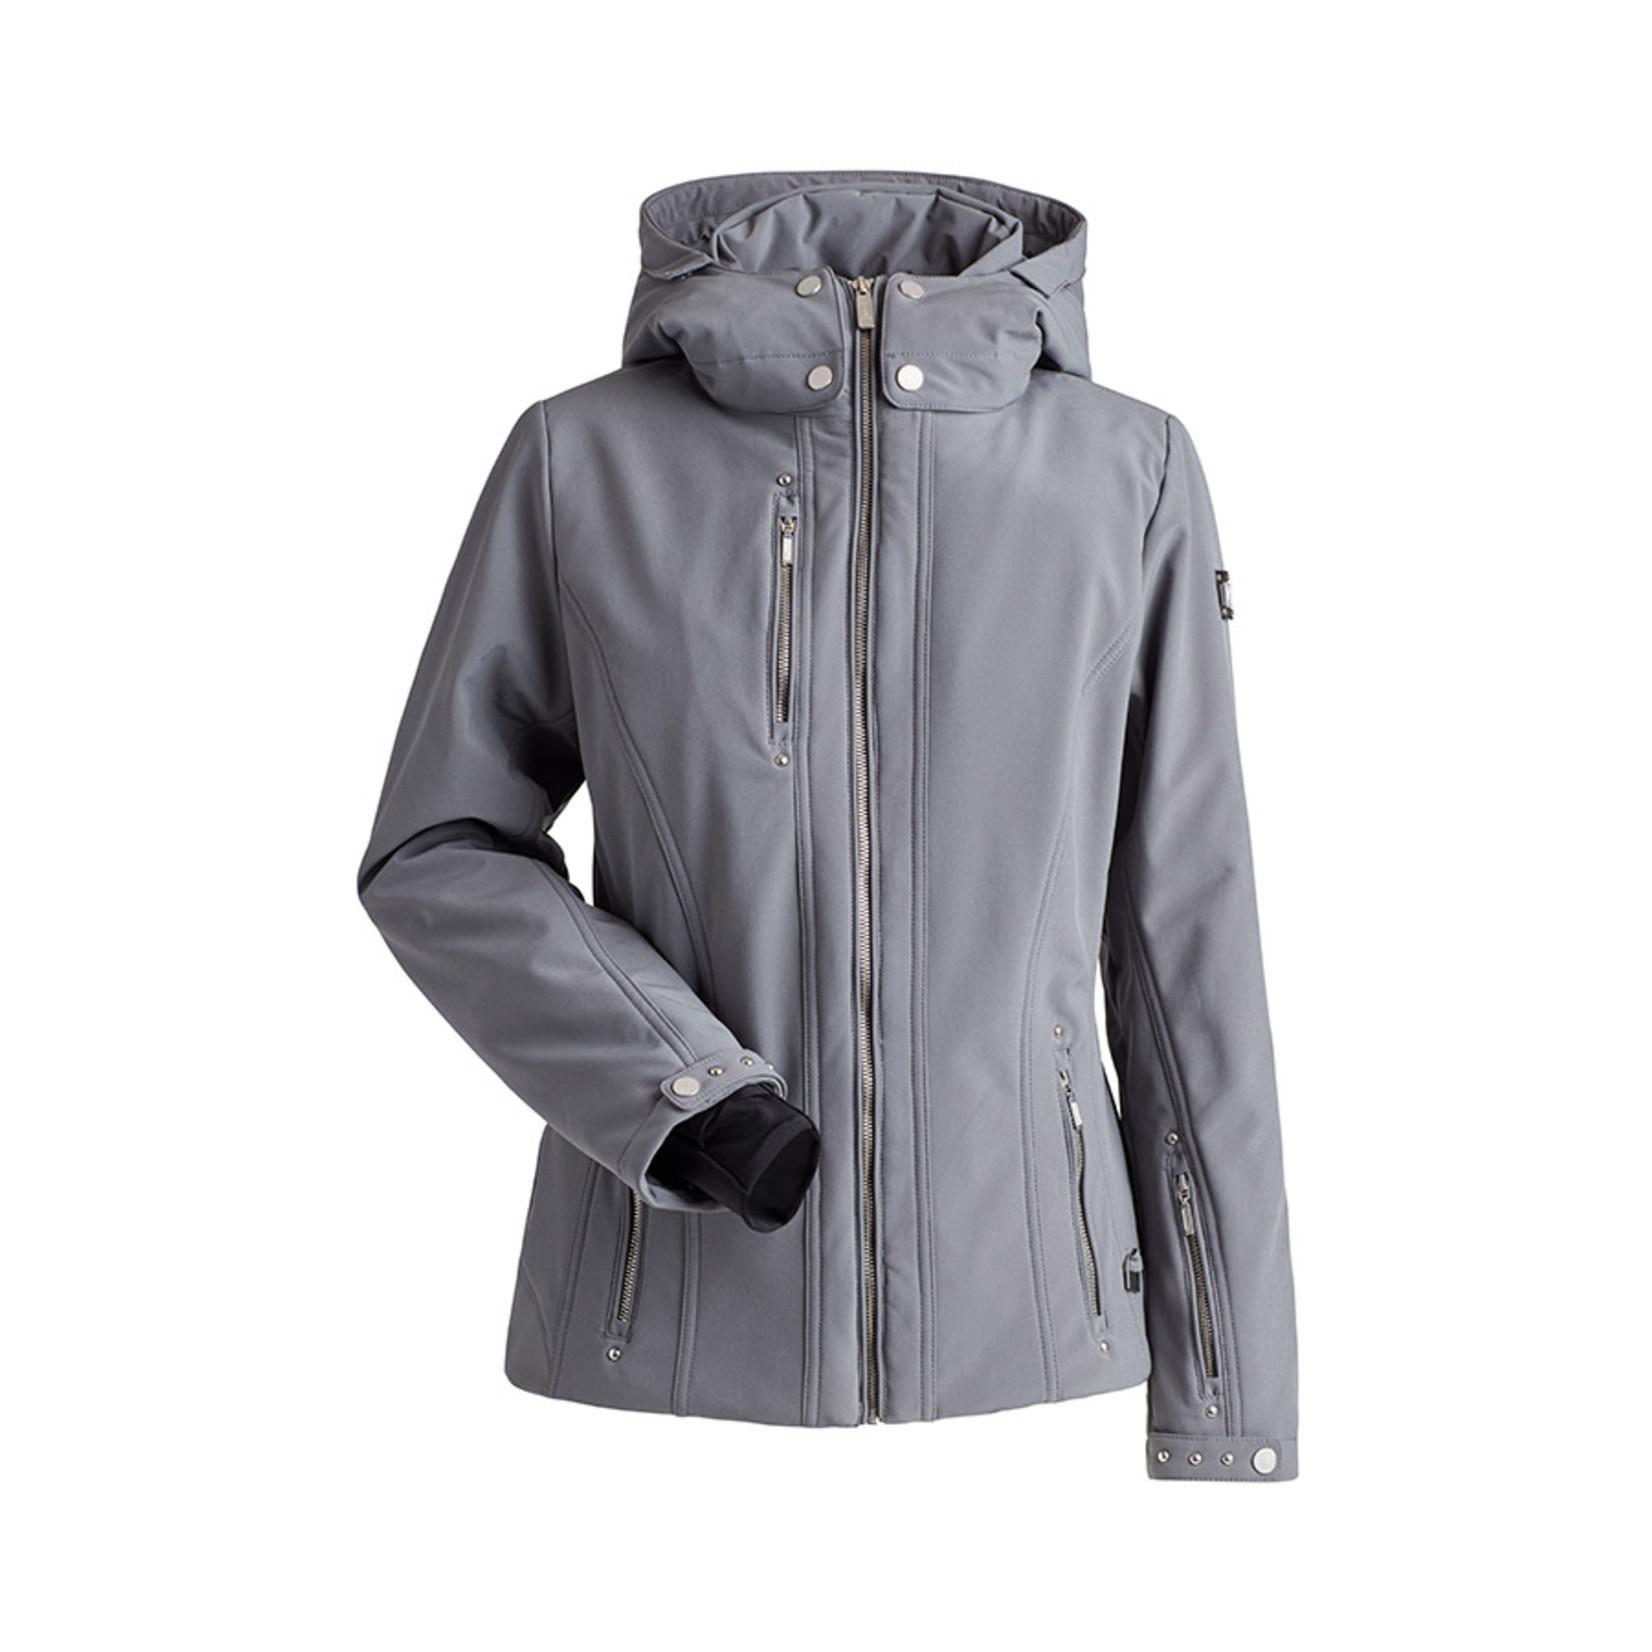 NILS NILS Cossette Women's Jacket